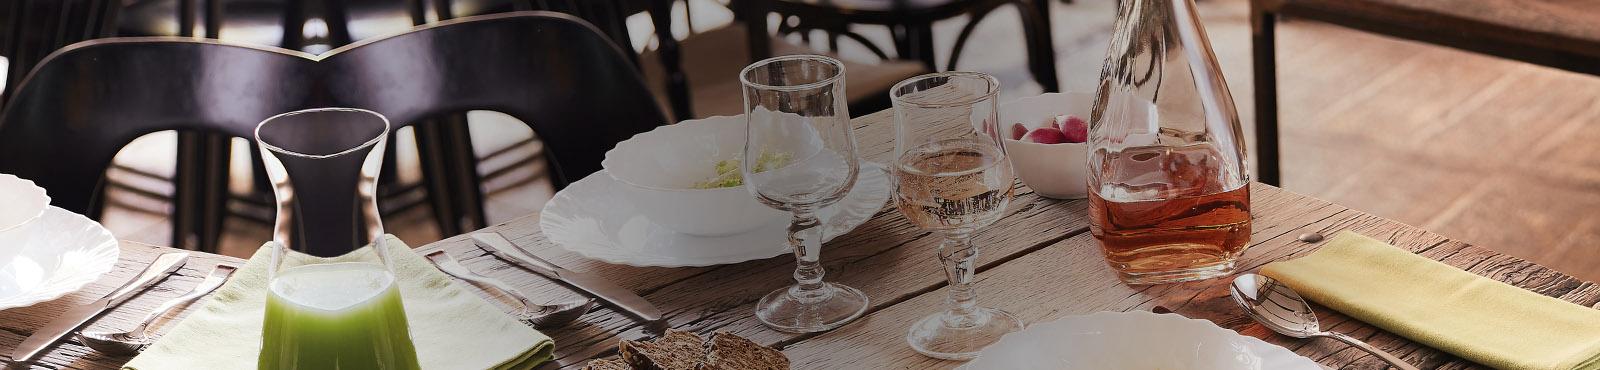 Table resto chic assiette Intensity Origine verre Salto et verre à pied Vina